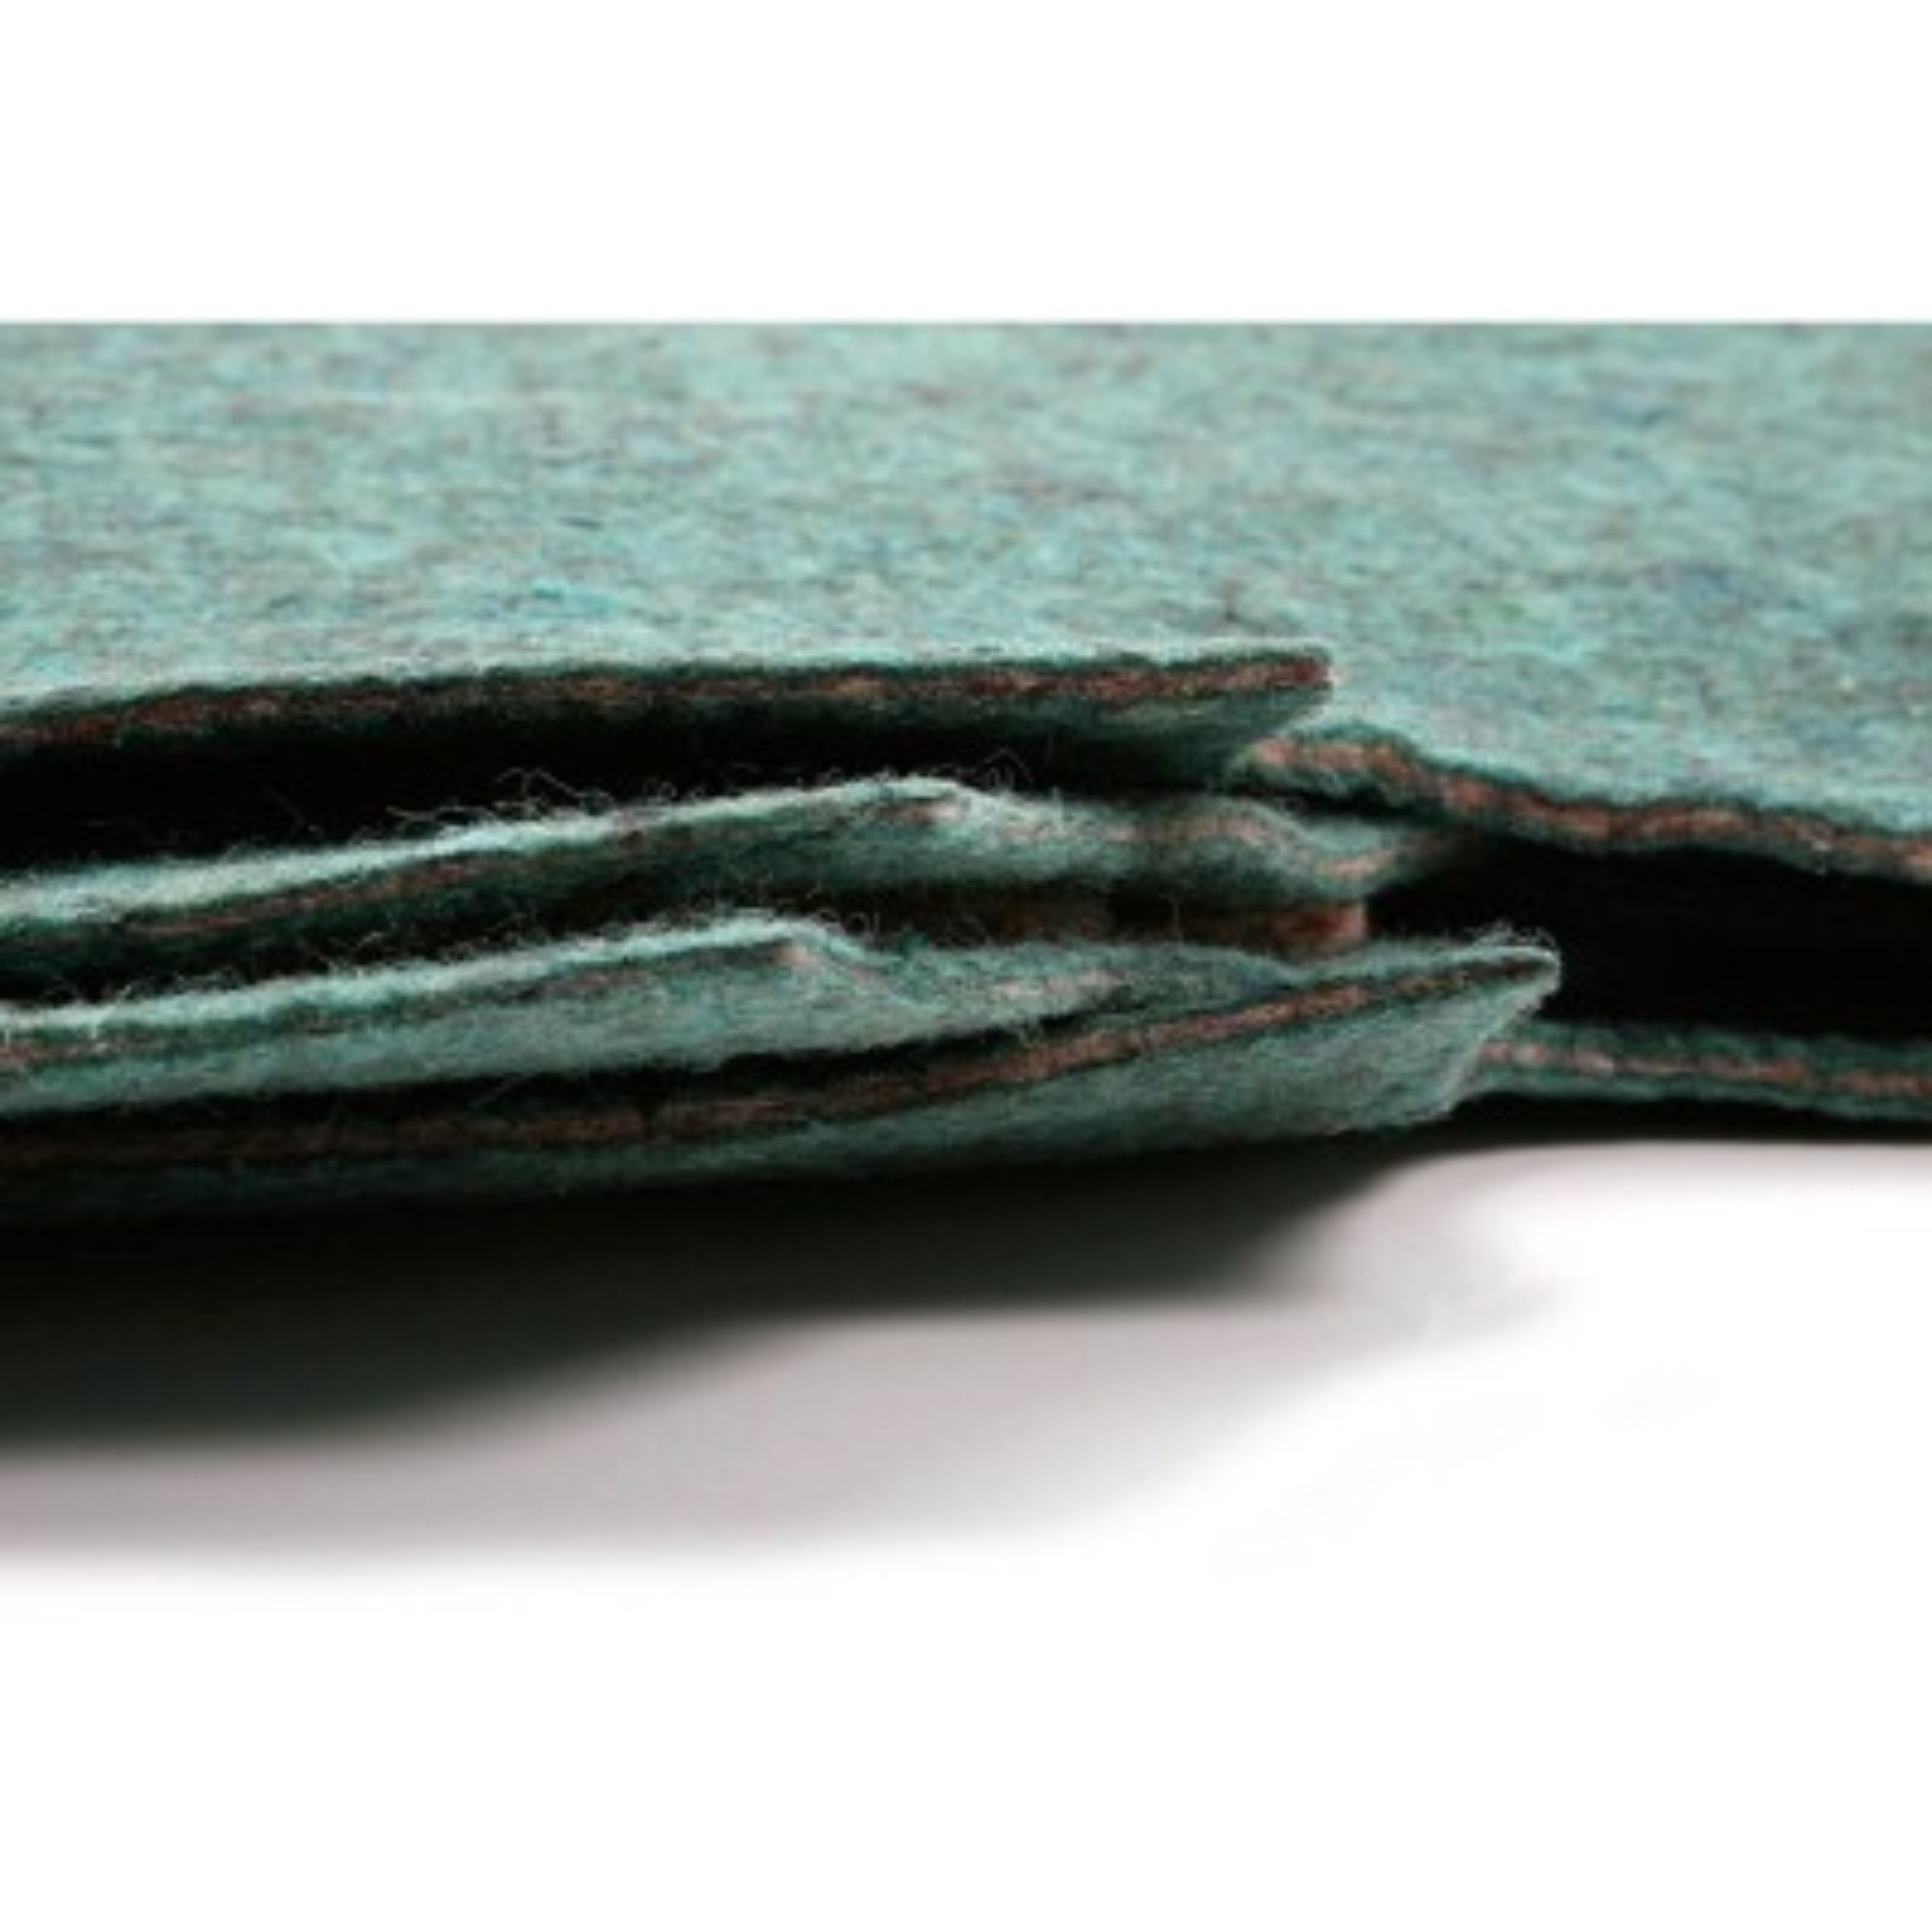 116 023 Under Carpet Sound Insulation Kit Moss Motors